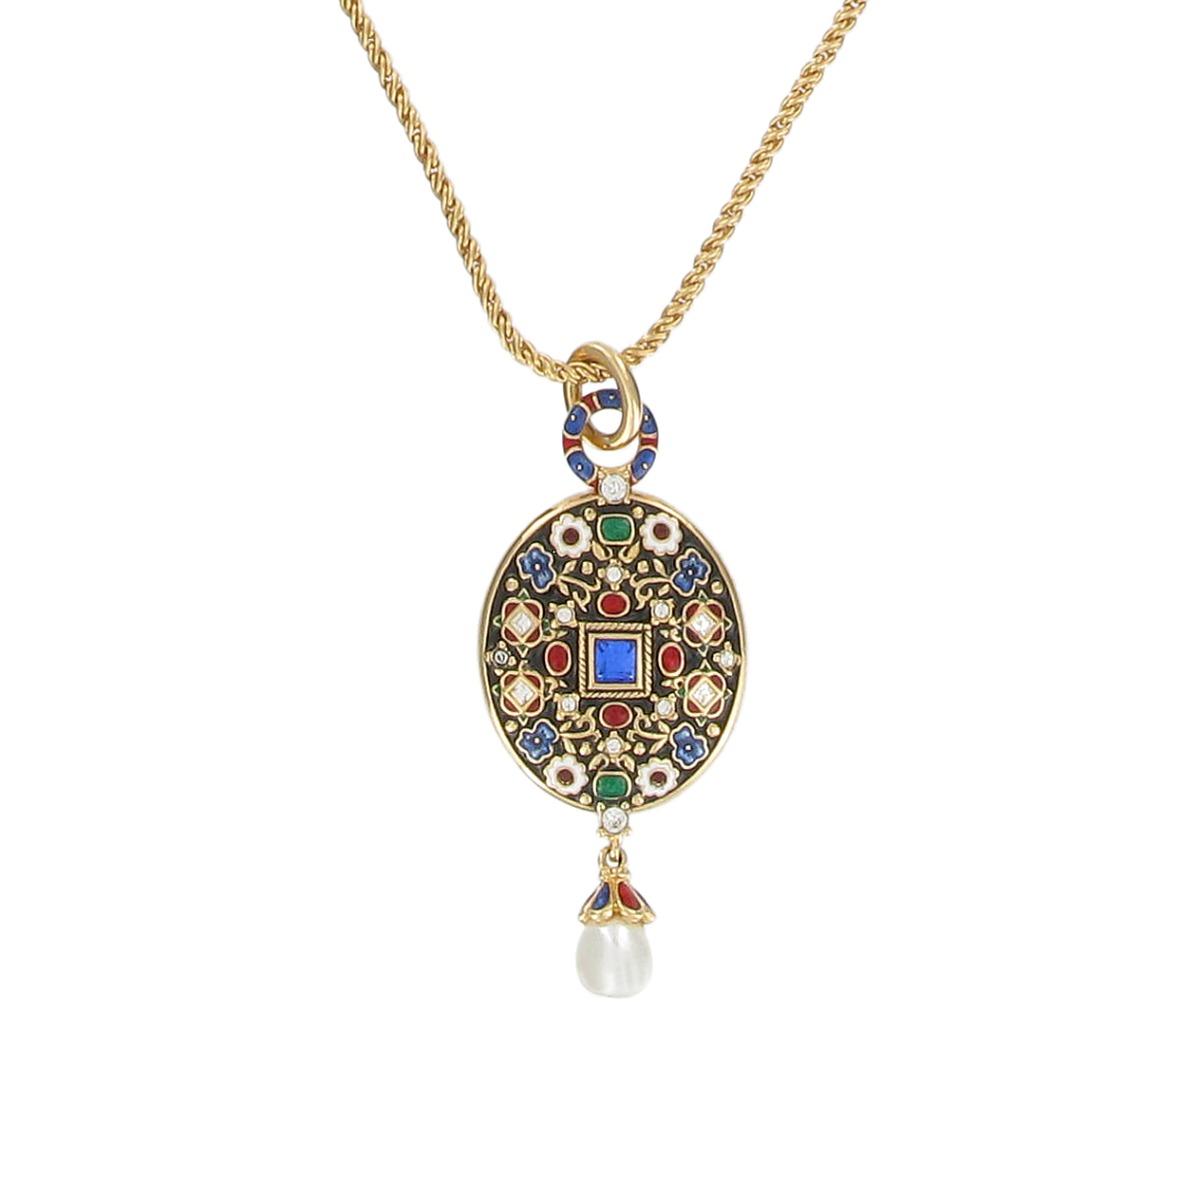 Grenville pendant necklace